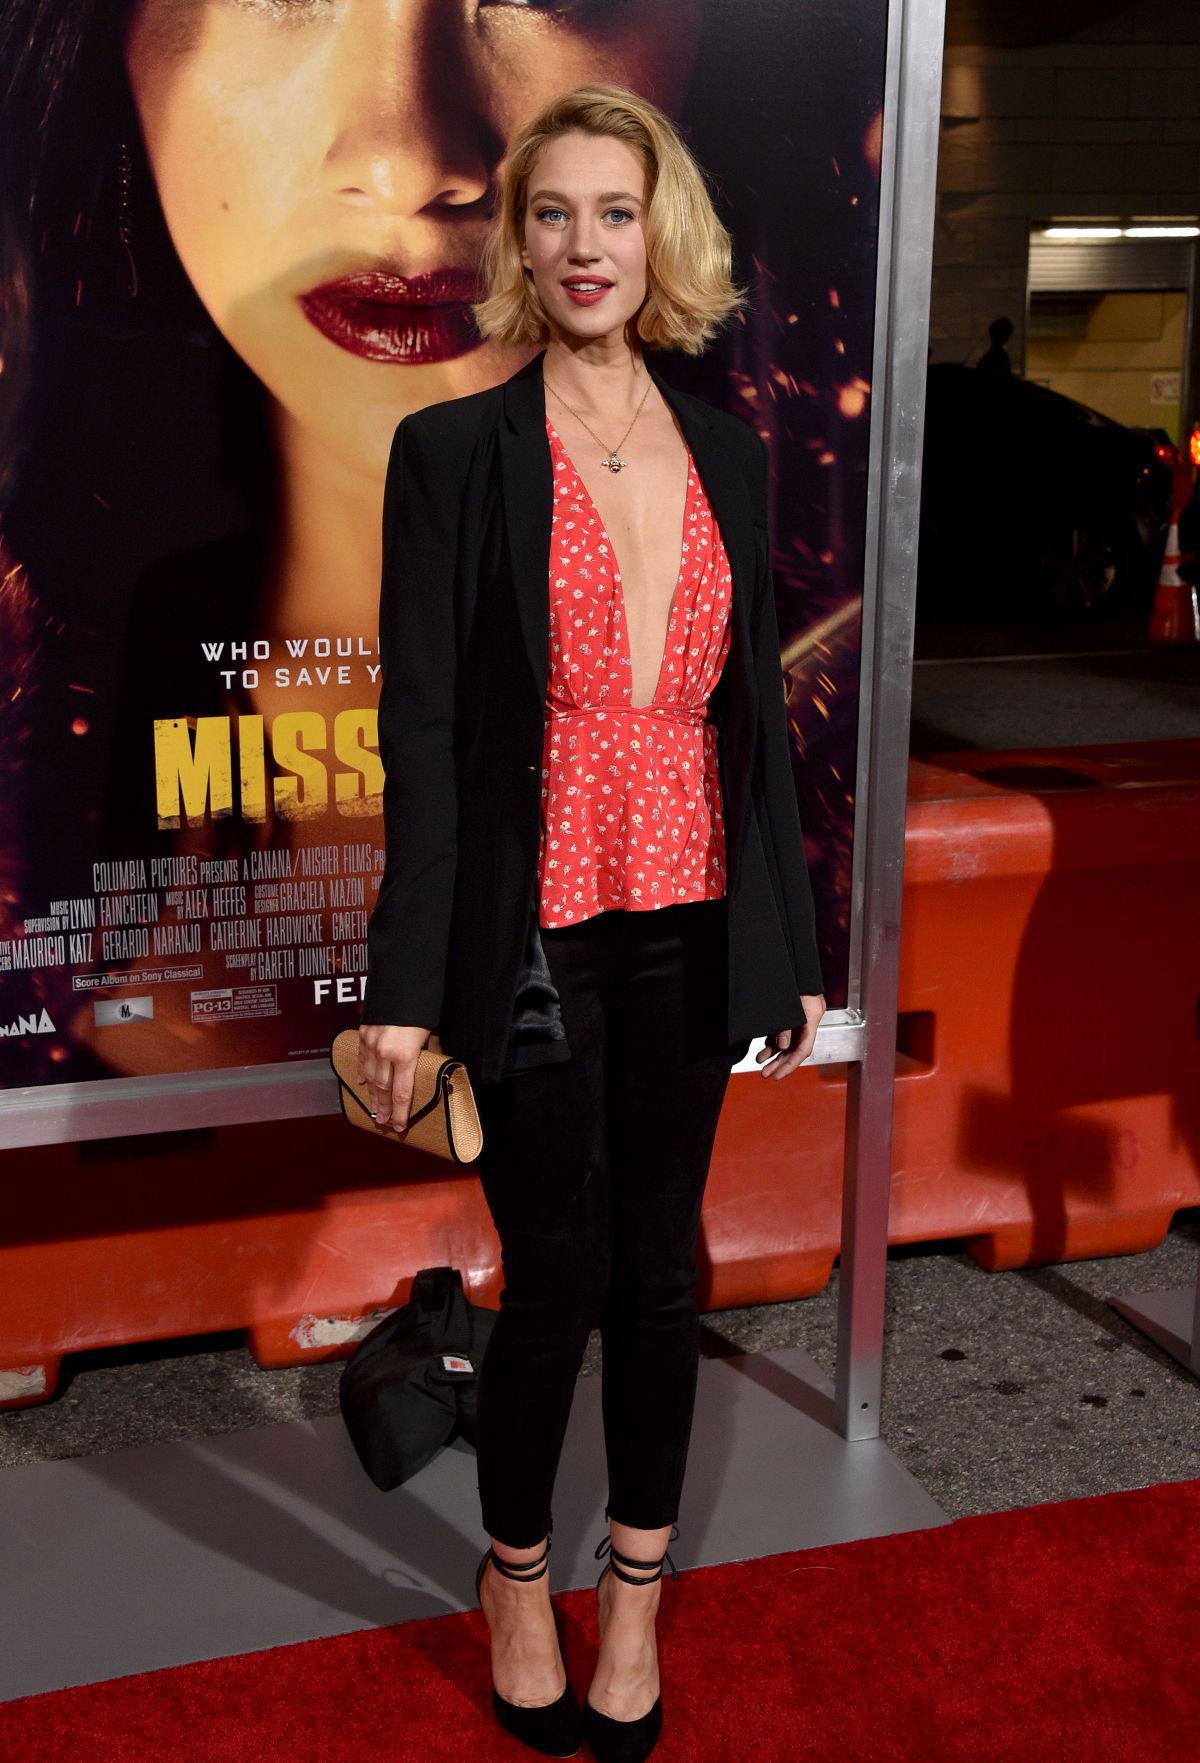 Yael Grobglas at Miss Bala Premiere in Los Angeles